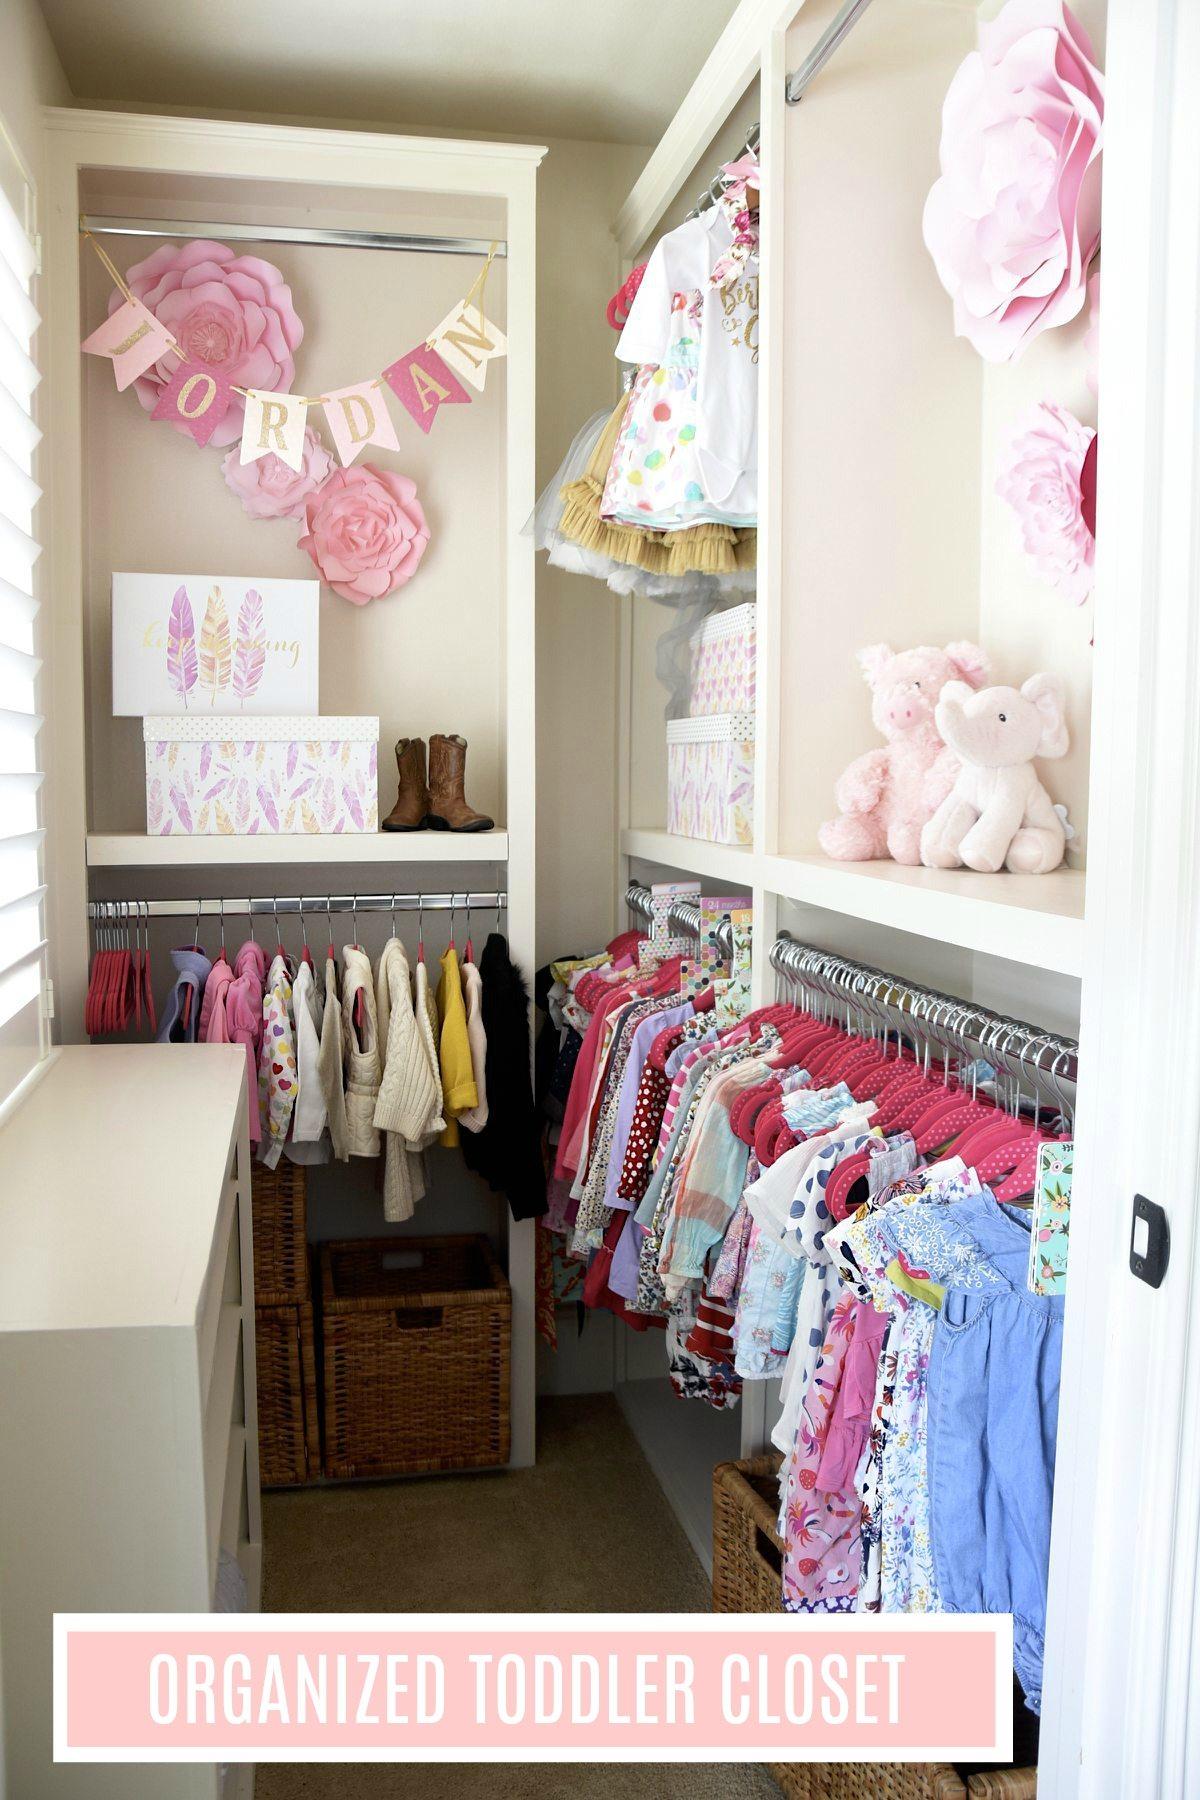 organized toddler closet